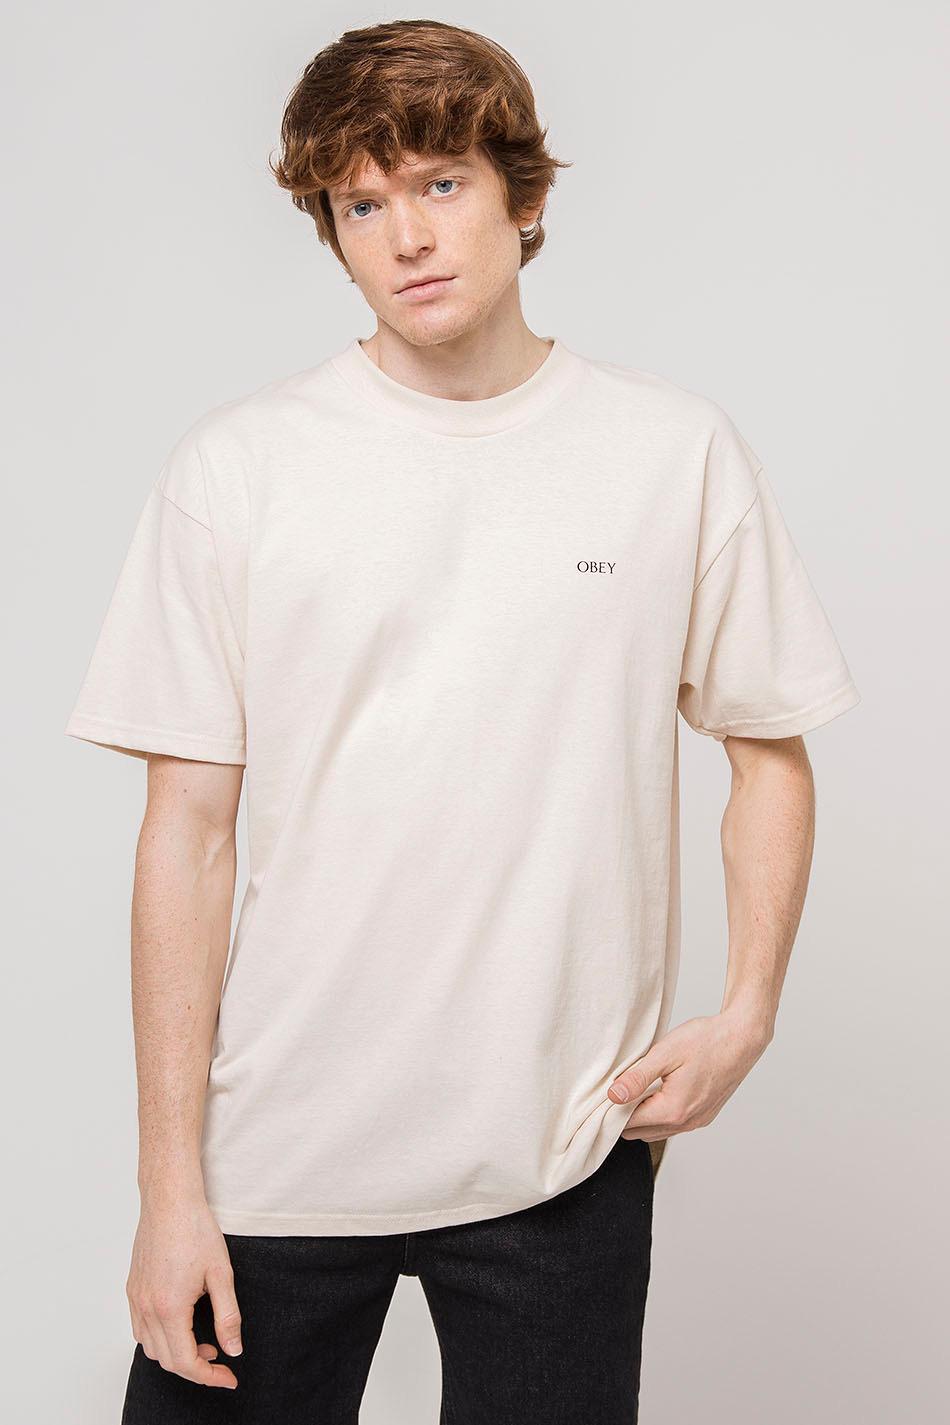 Obey Crosswalk Sign Cream T-Shirt